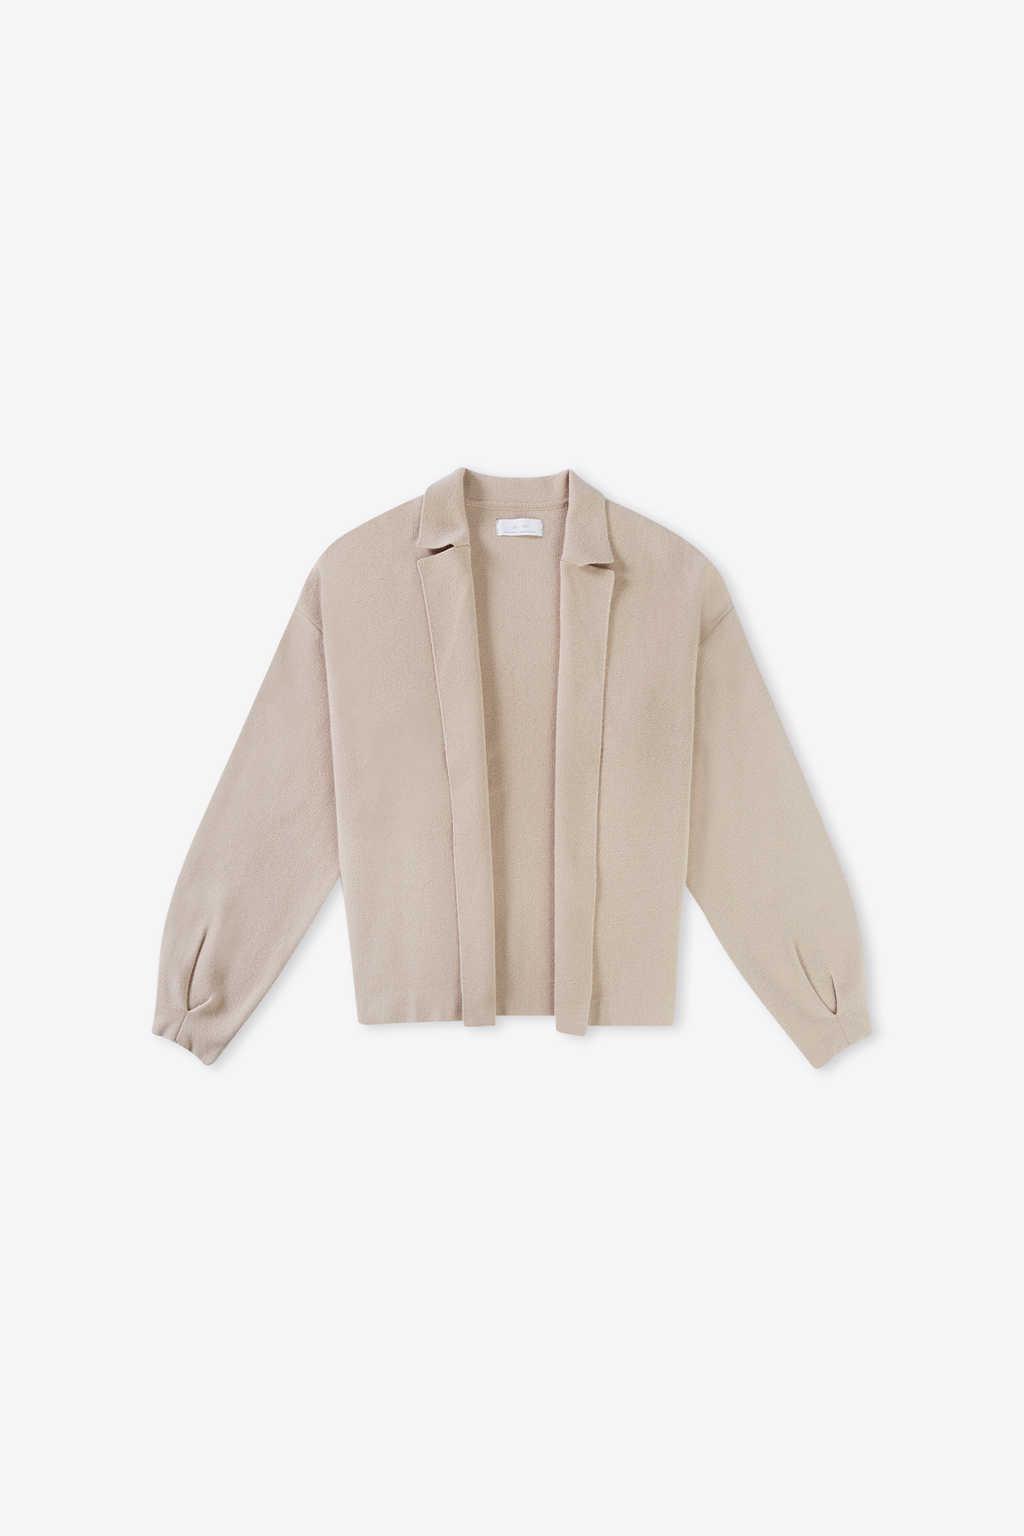 Sweater 2470 Oatmeal 11